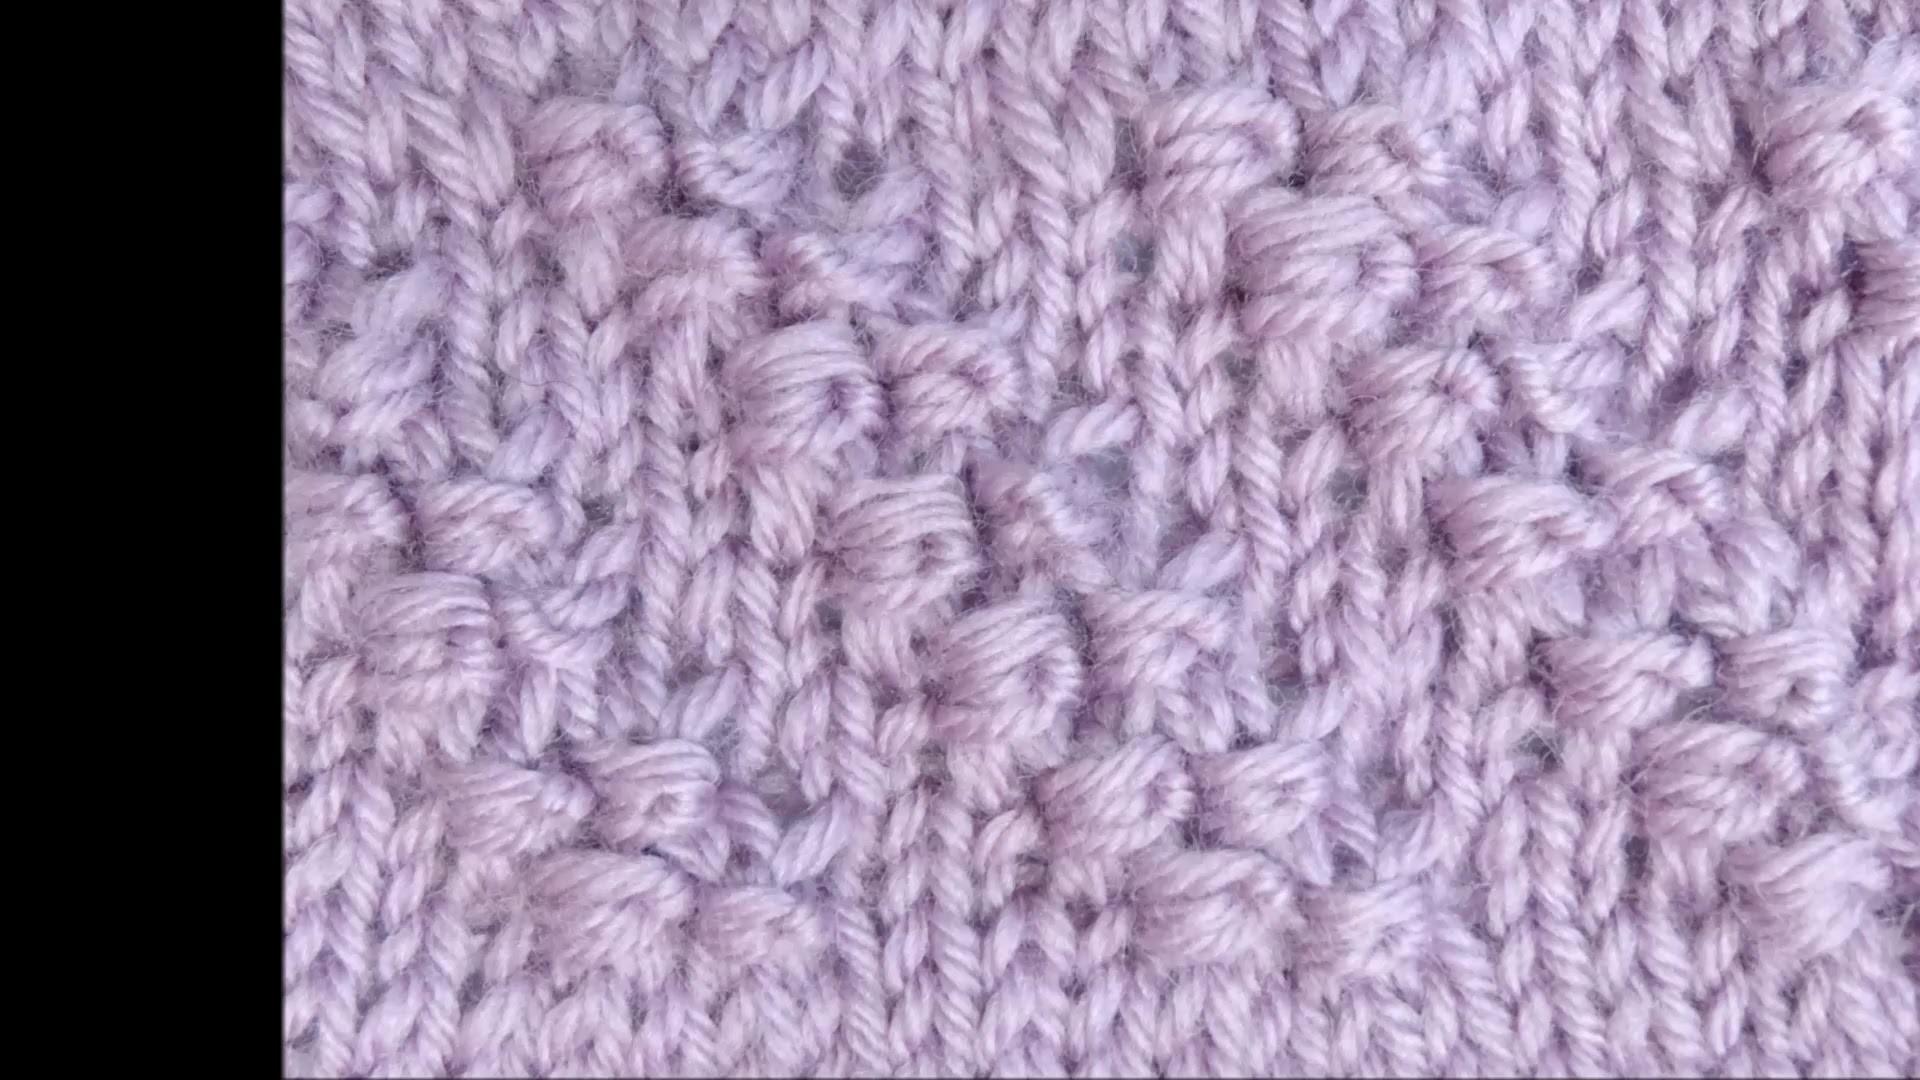 Strickmuster Diagonale Knoten mit Wickelmaschen - Knitting Diagonal Knots with Wrapped stitches 2